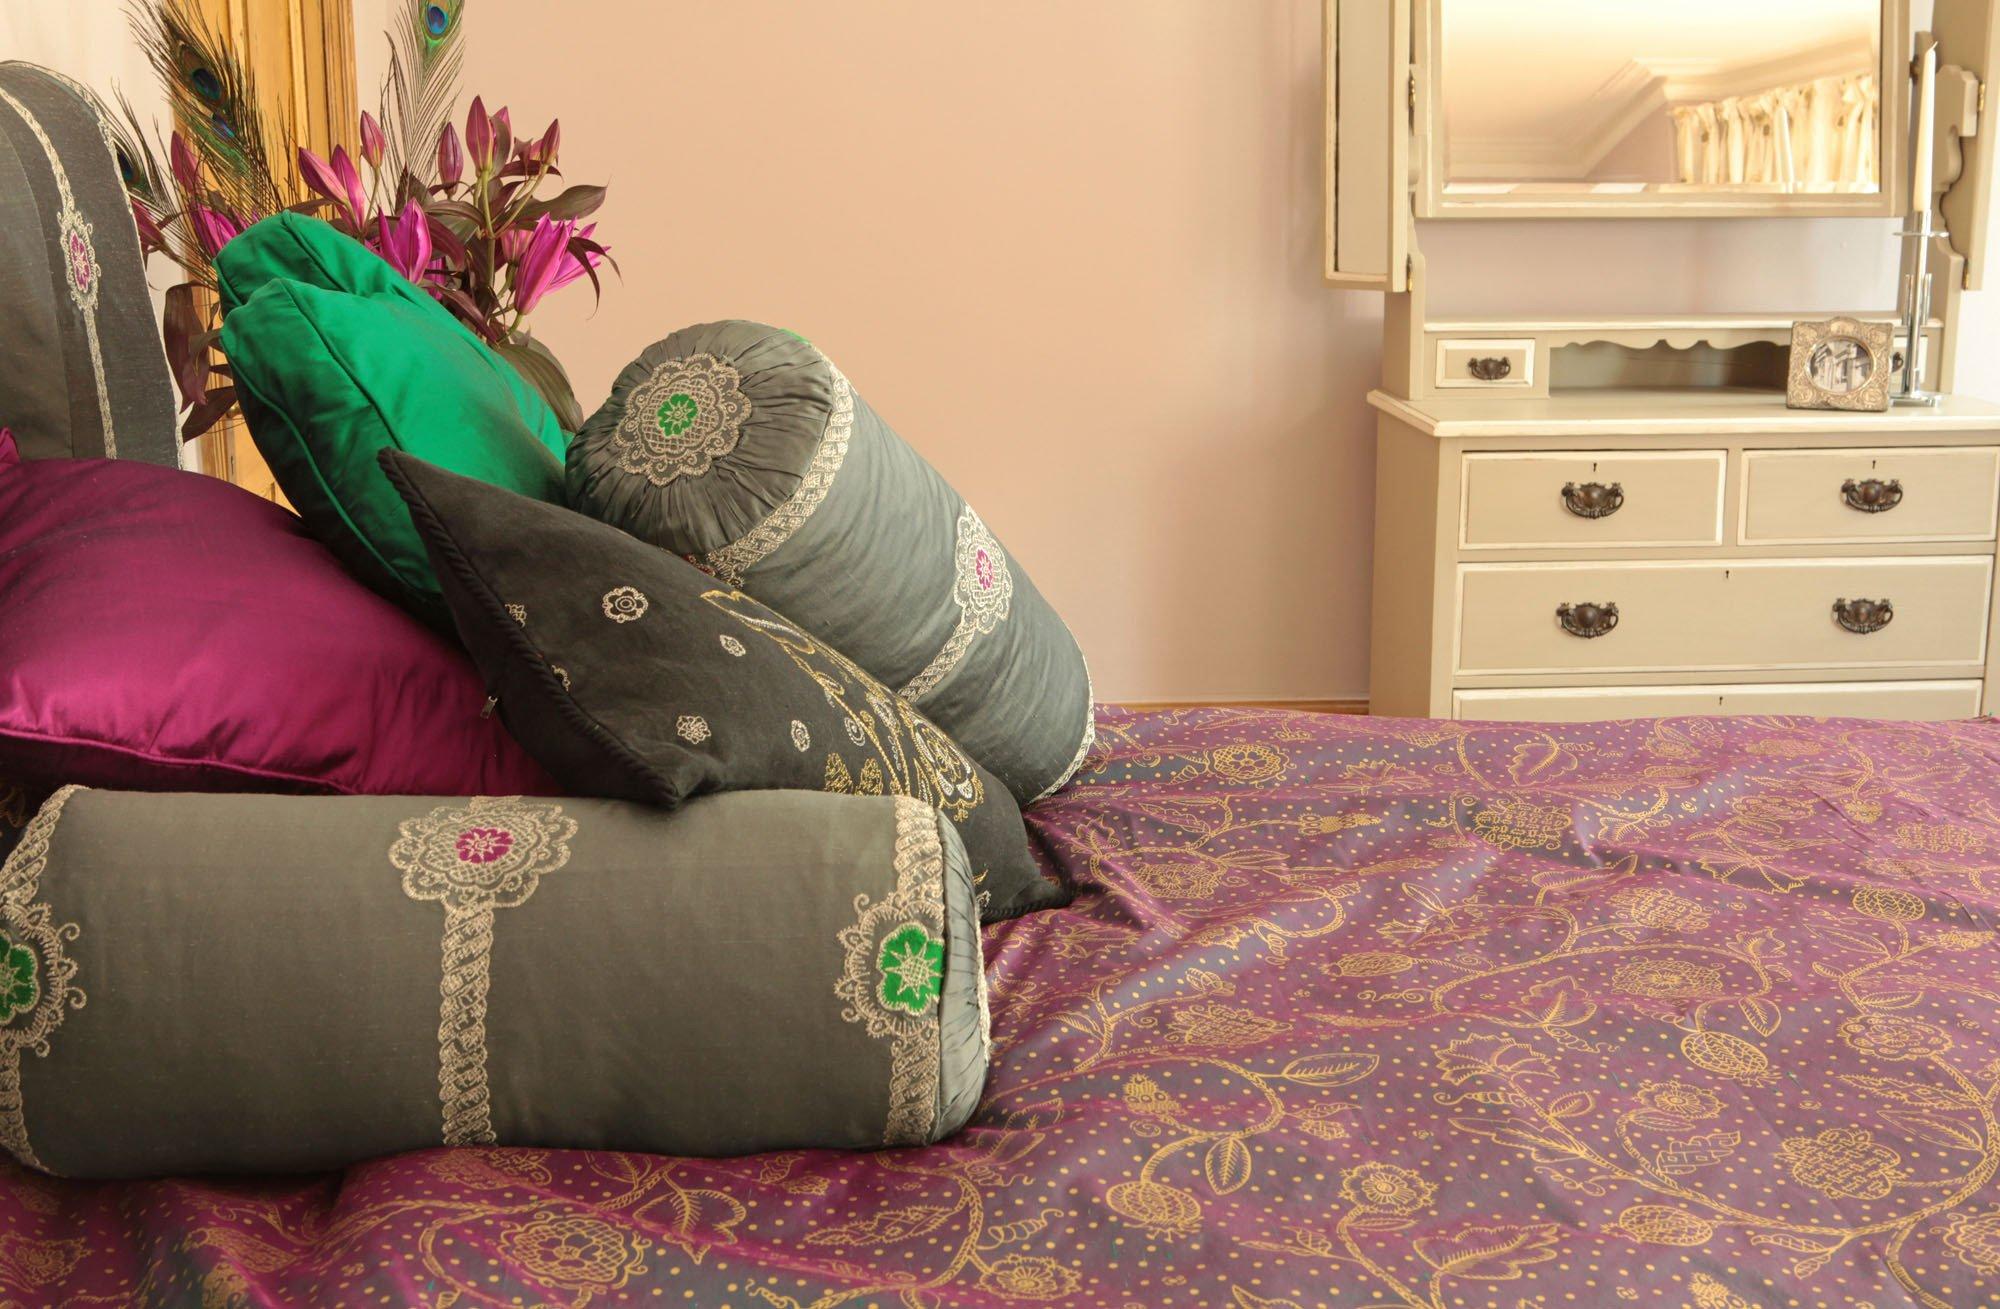 Подушка валик в стиле прованс